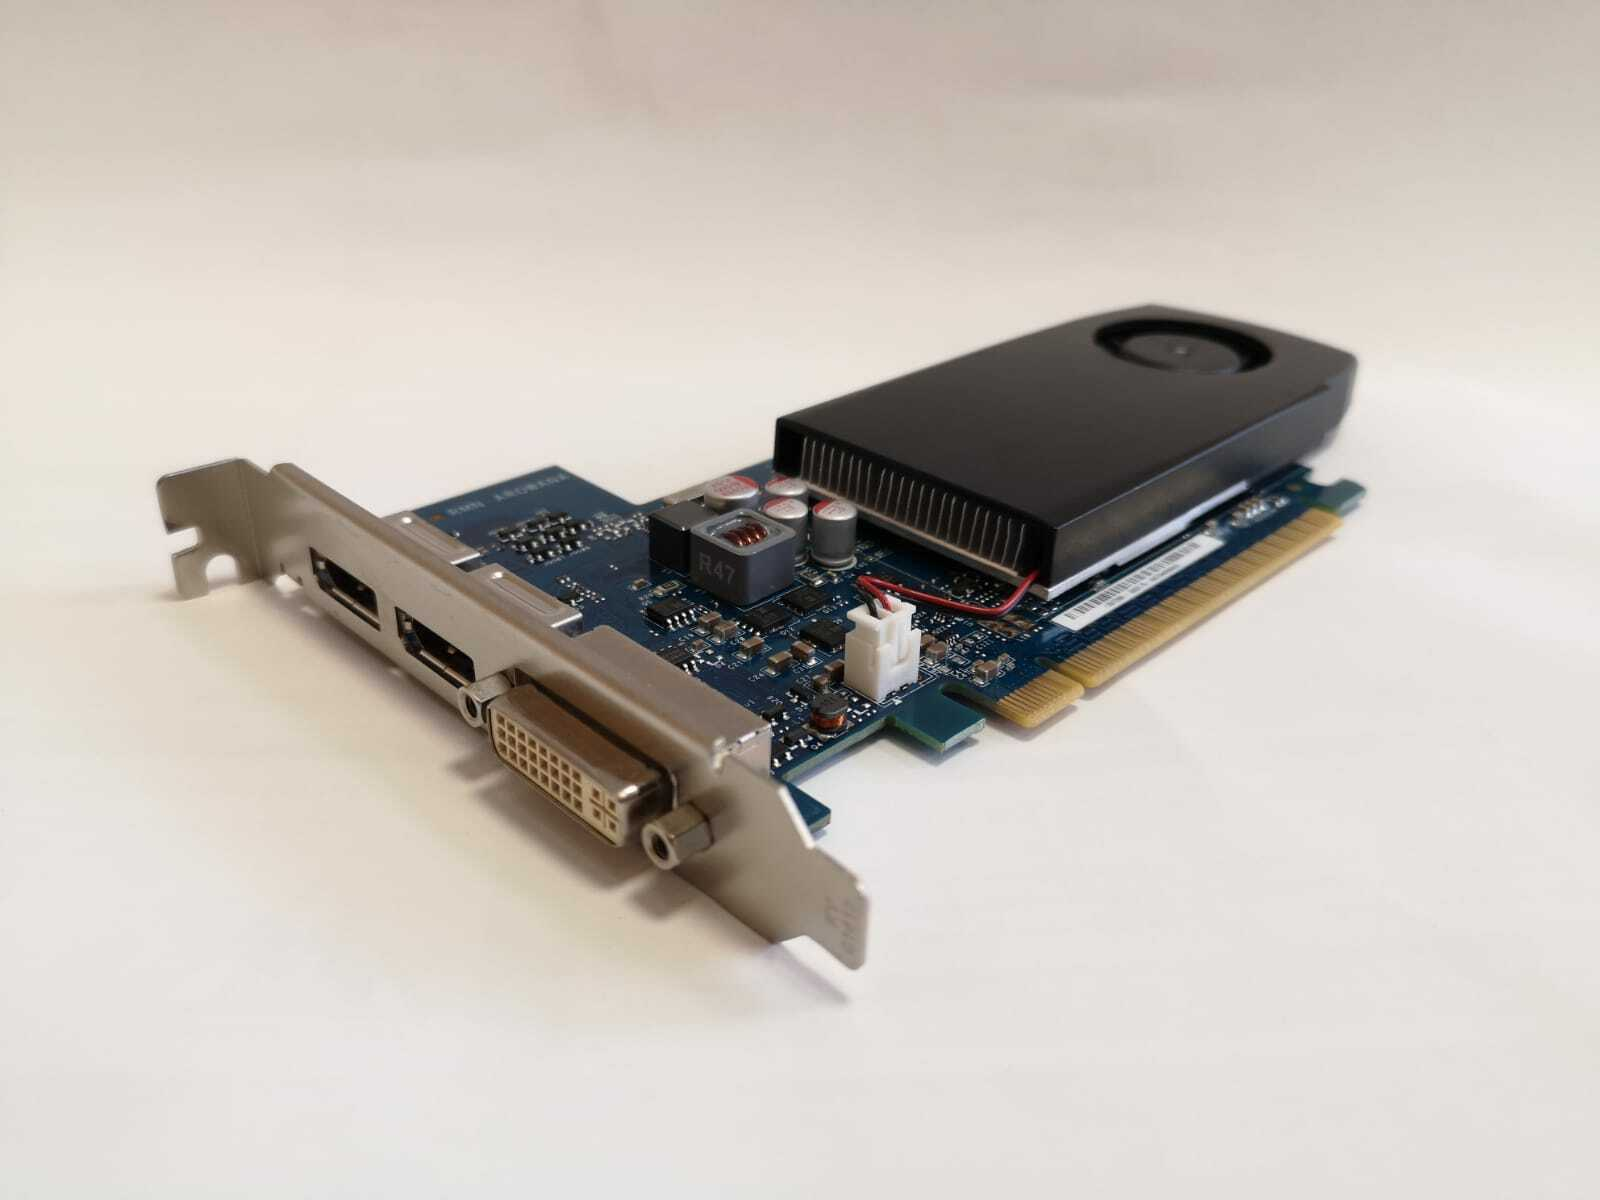 NVidia GeForce GT 630 2GB RAM Apple Mac Pro 2008 - 2012 4K Grafikkarte 2x DP DVI